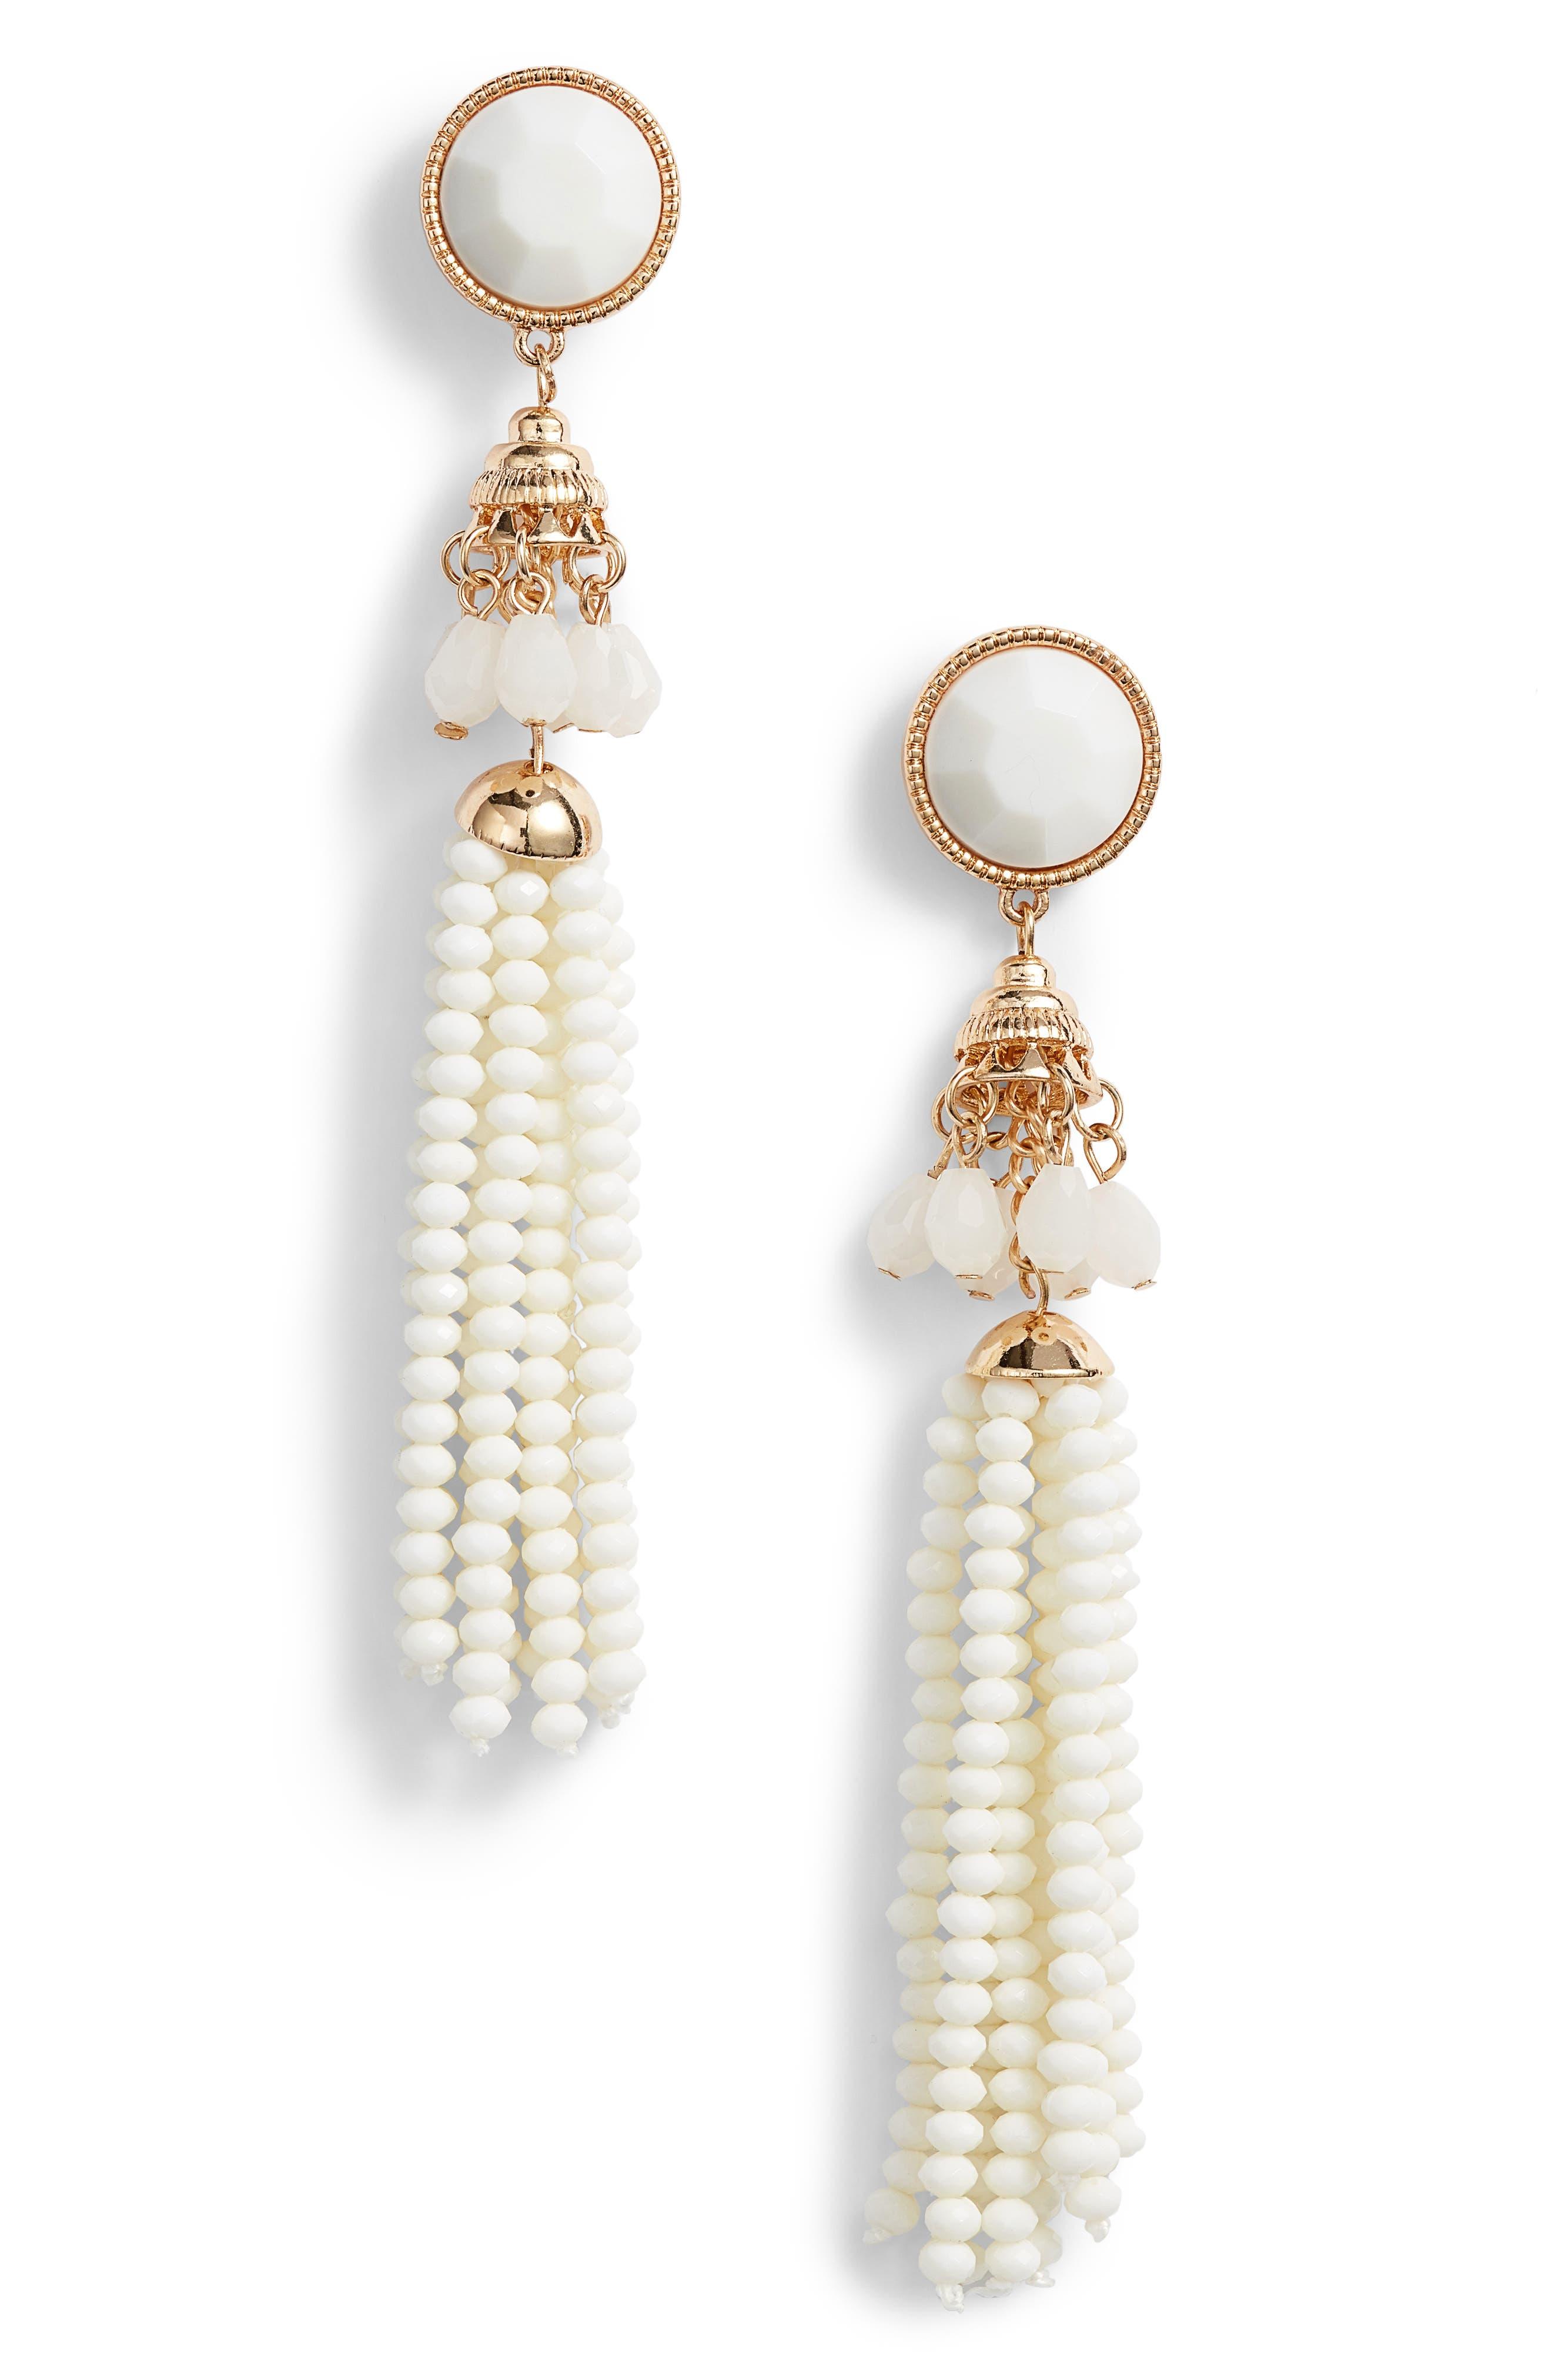 Beaded Tassel Earrings,                             Main thumbnail 1, color,                             Gold/ Cream